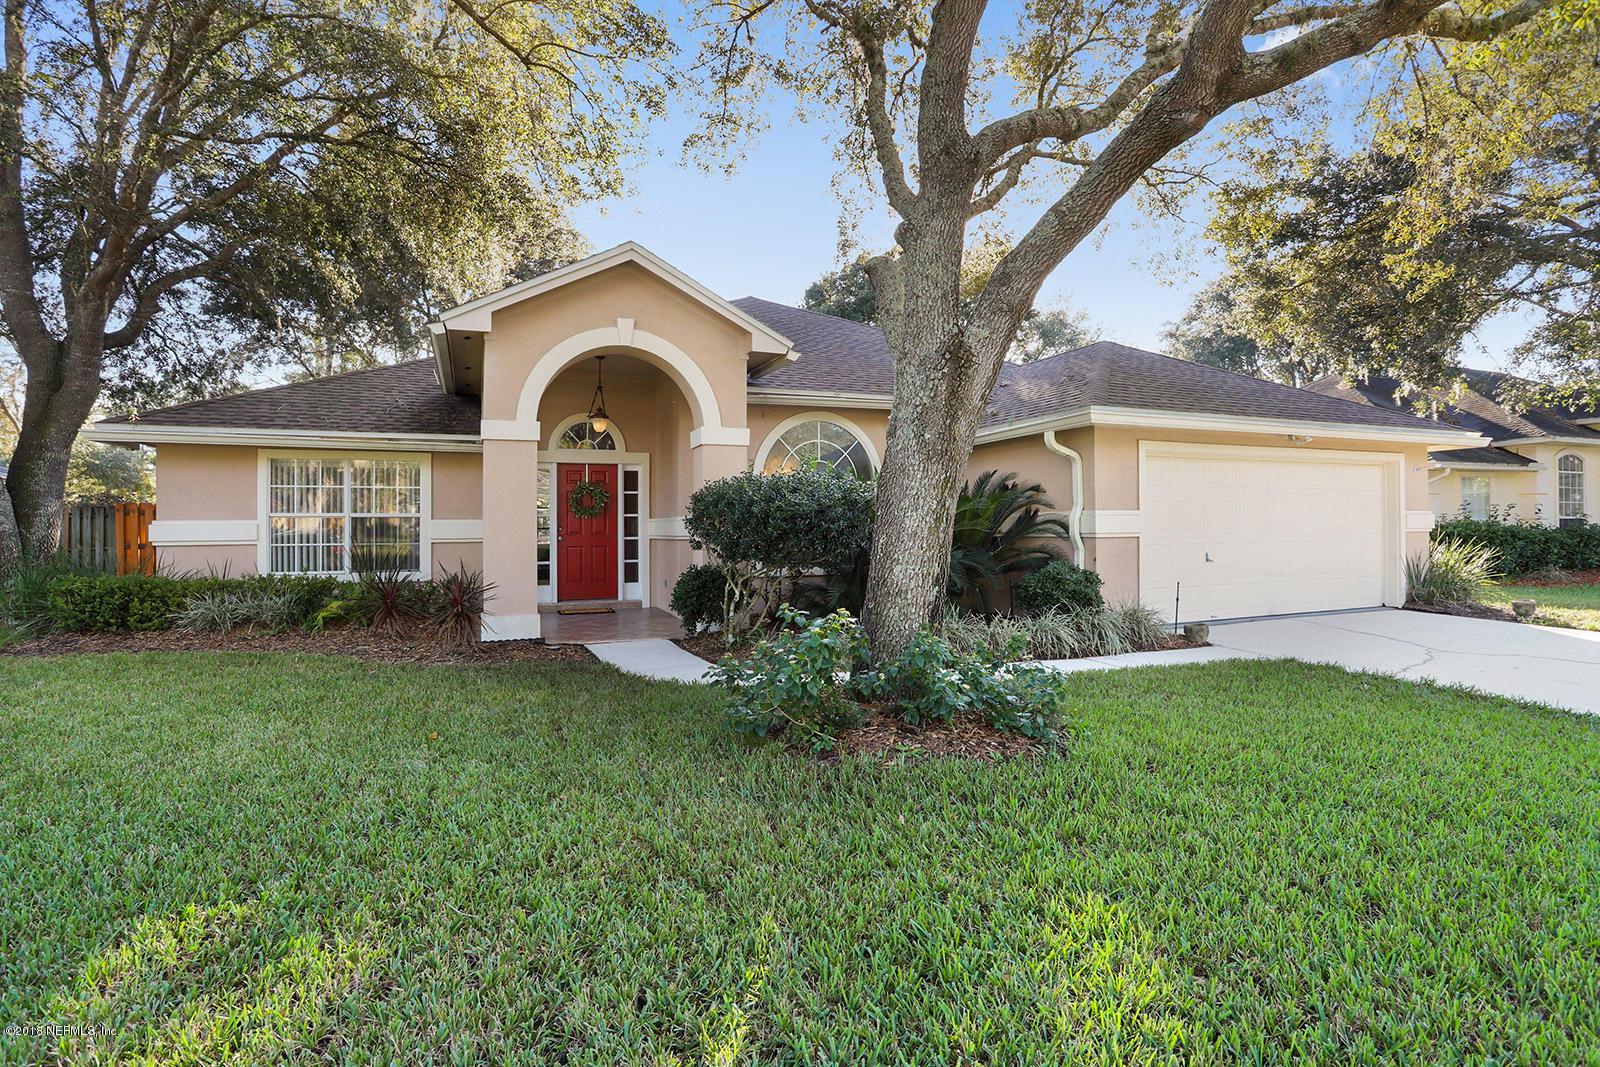 1056 FLORA PARKE, ST JOHNS, FLORIDA 32259, 4 Bedrooms Bedrooms, ,2 BathroomsBathrooms,Residential - single family,For sale,FLORA PARKE,968925